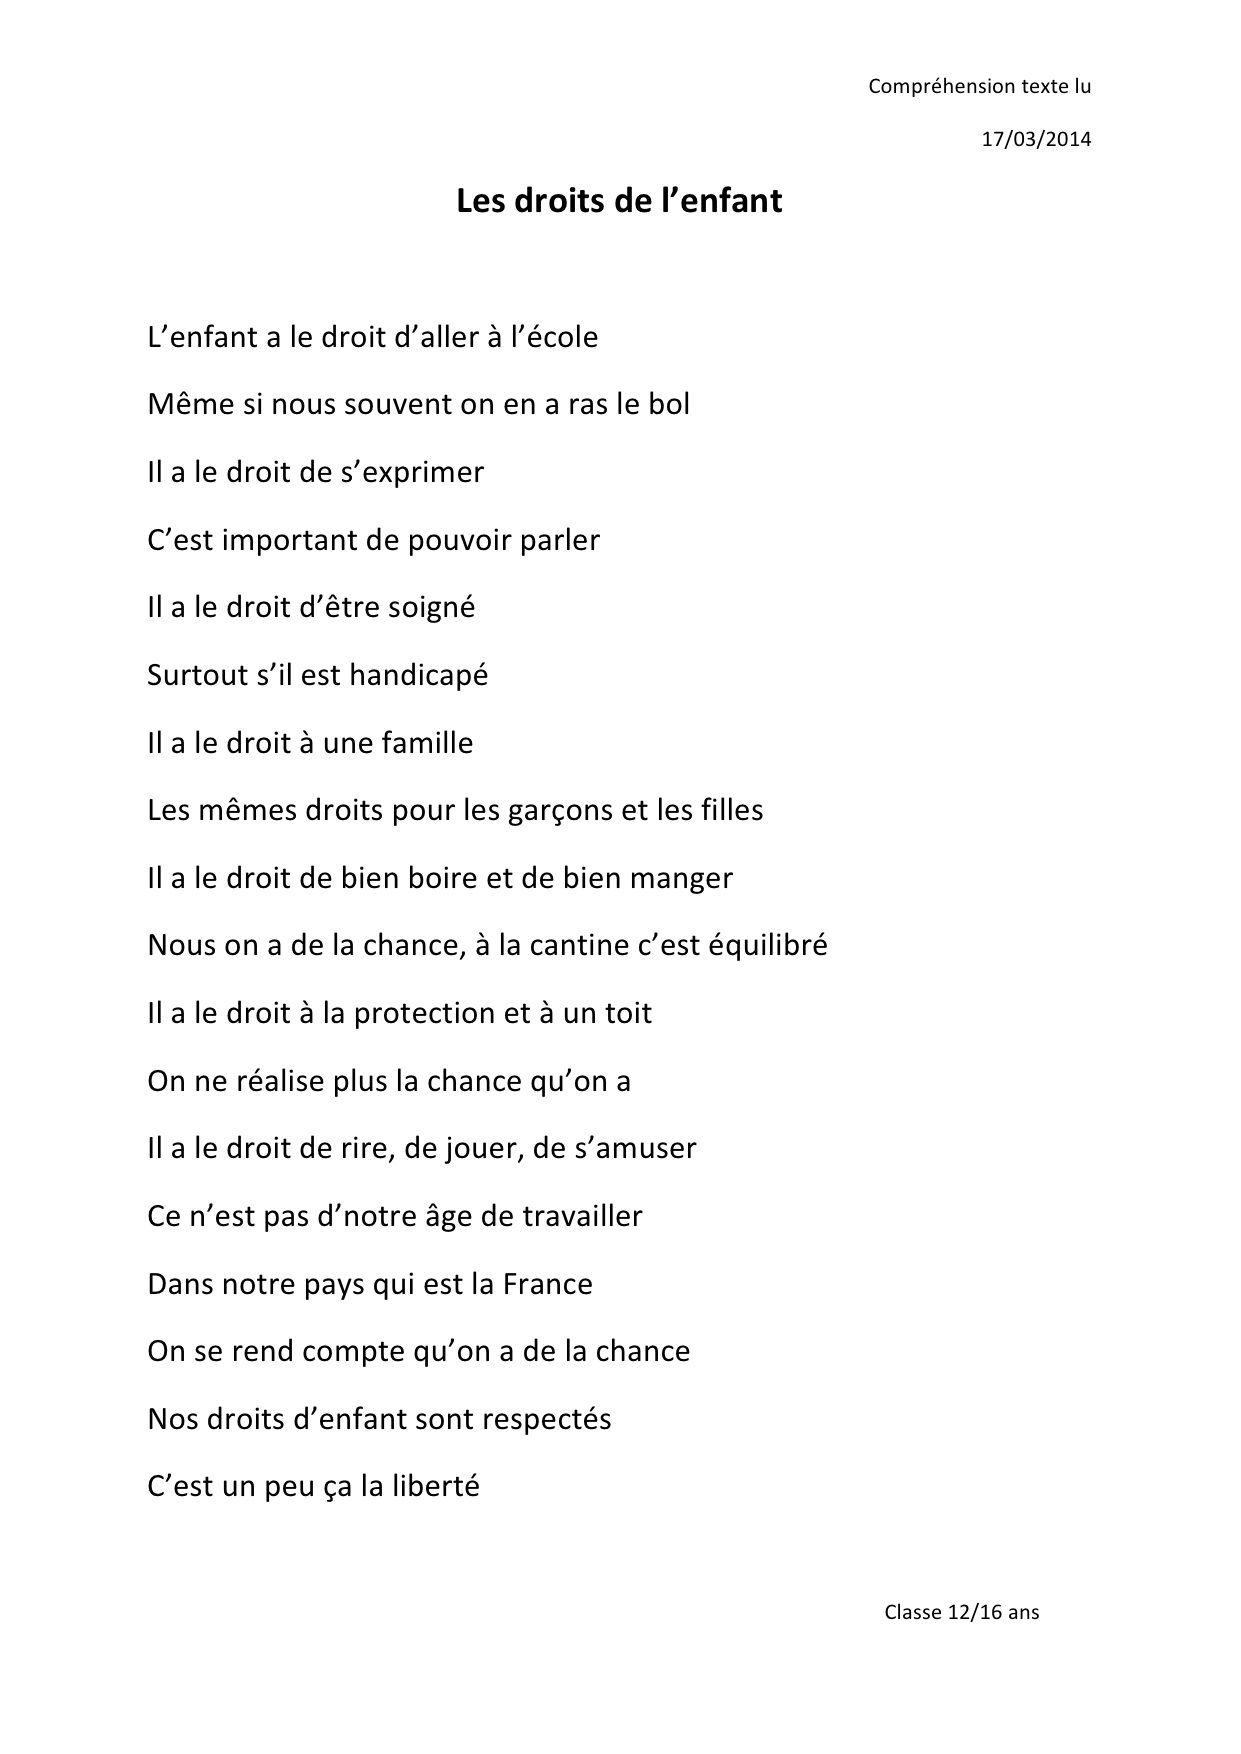 Poesie Engagee Exemple